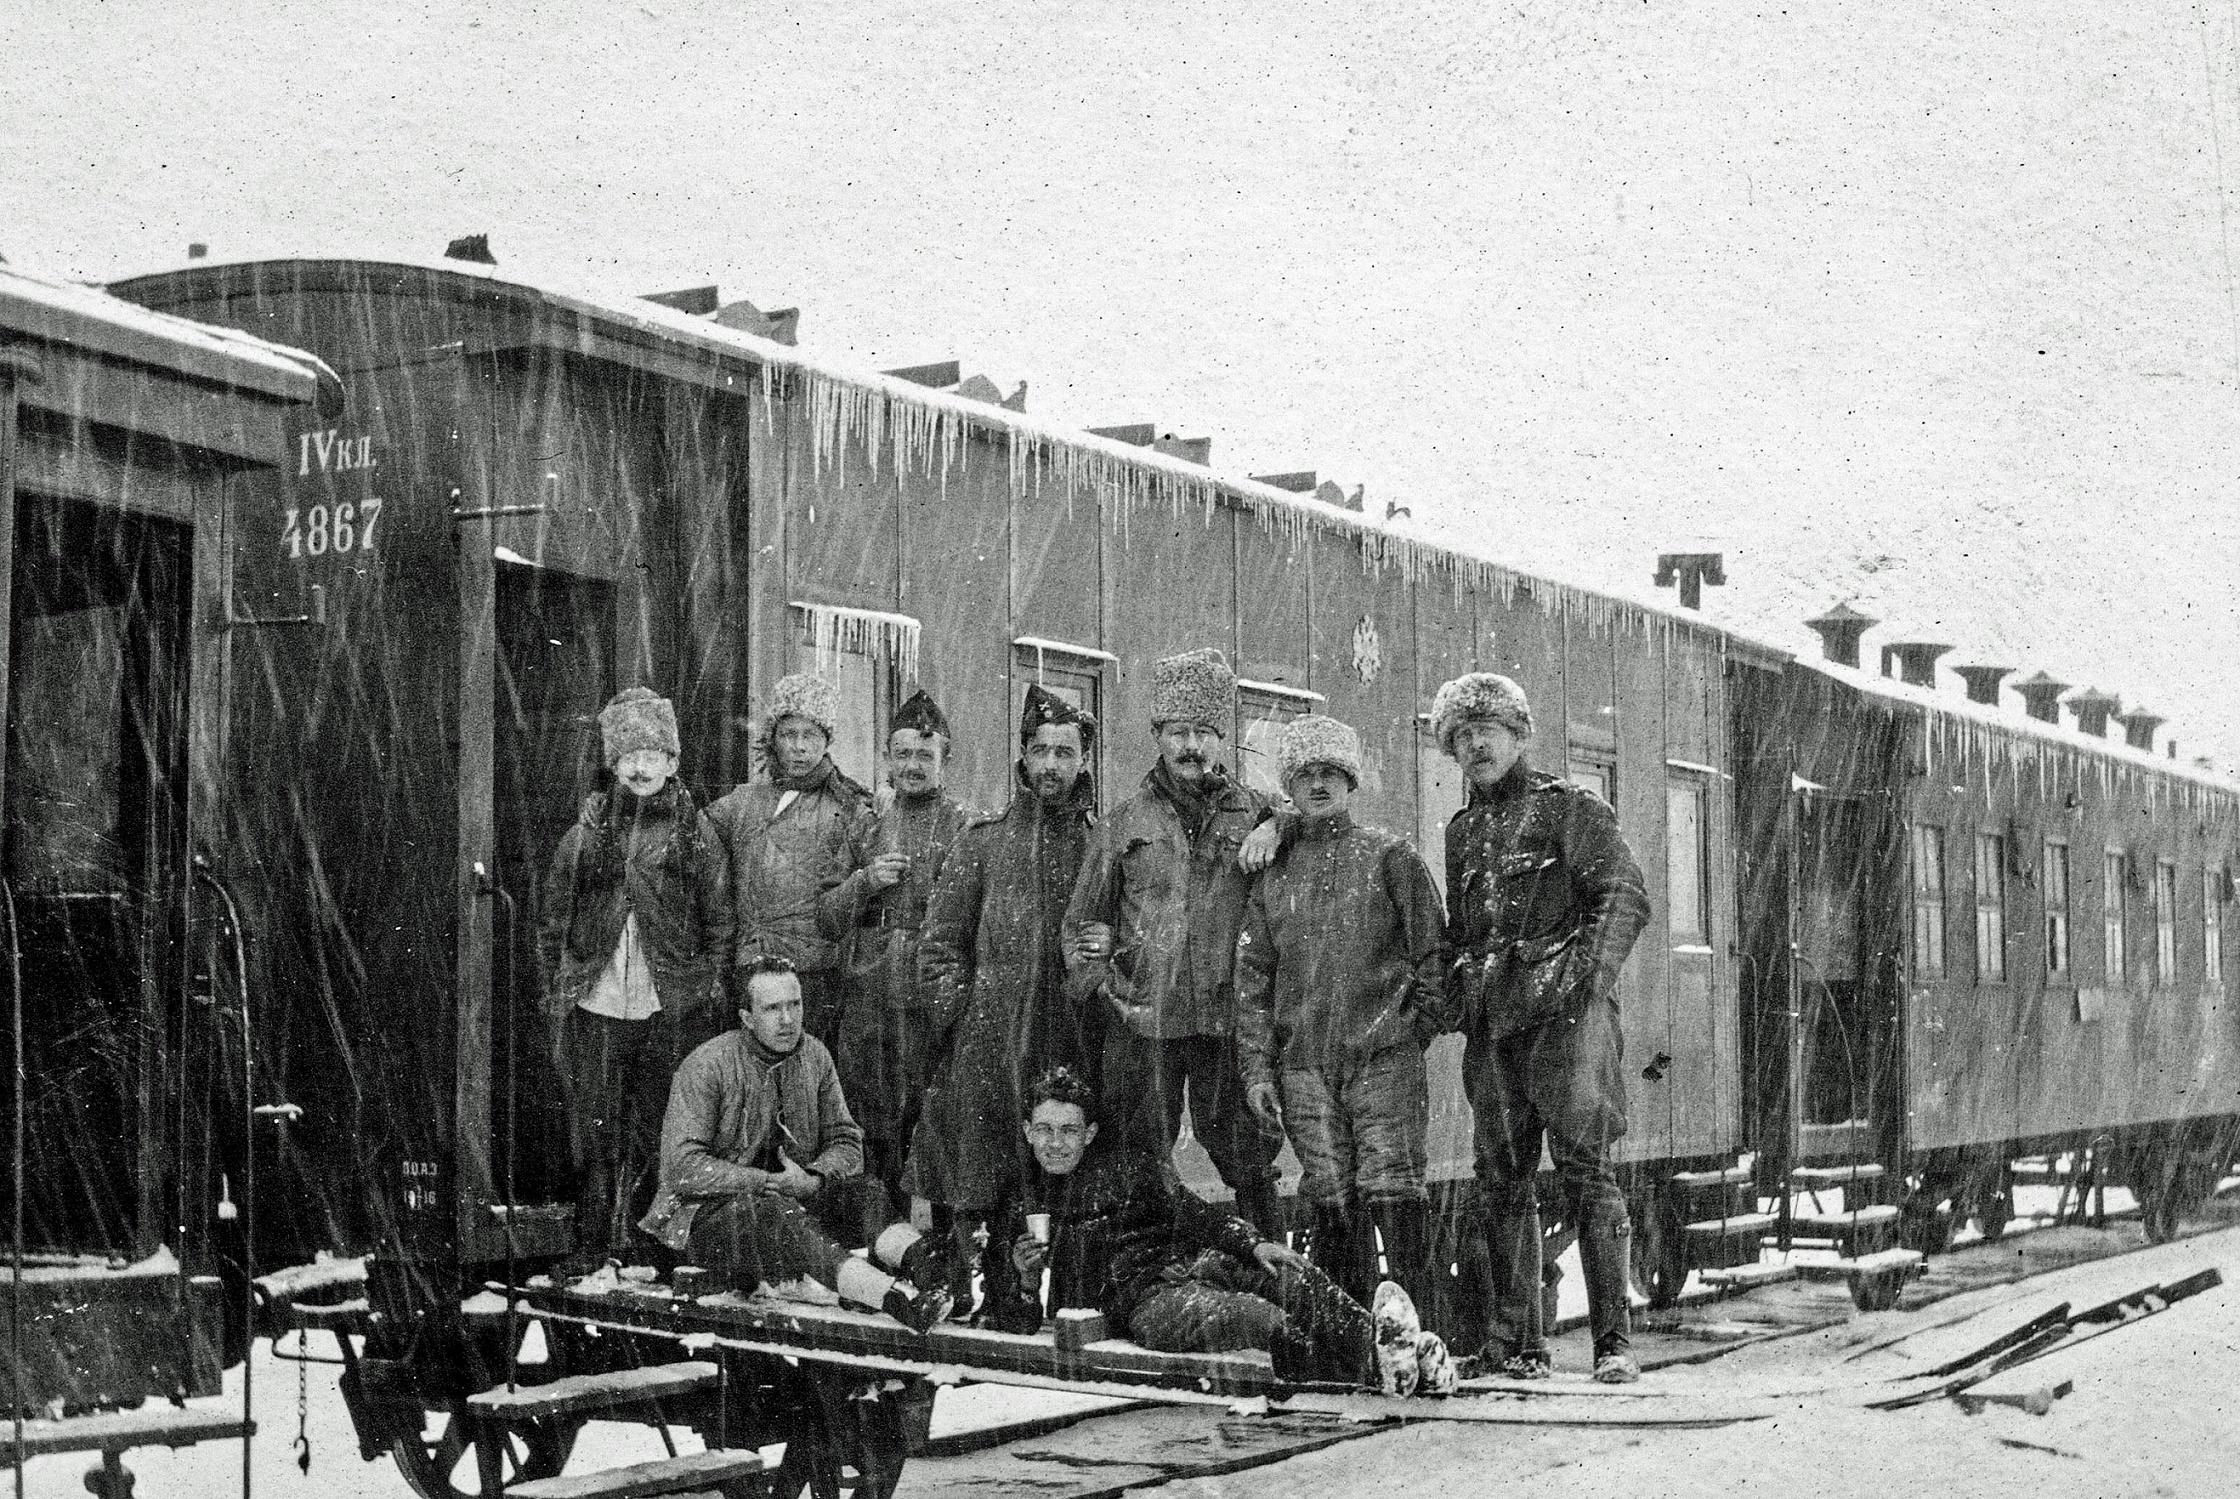 Remarkable First World War story of survival gets English translation